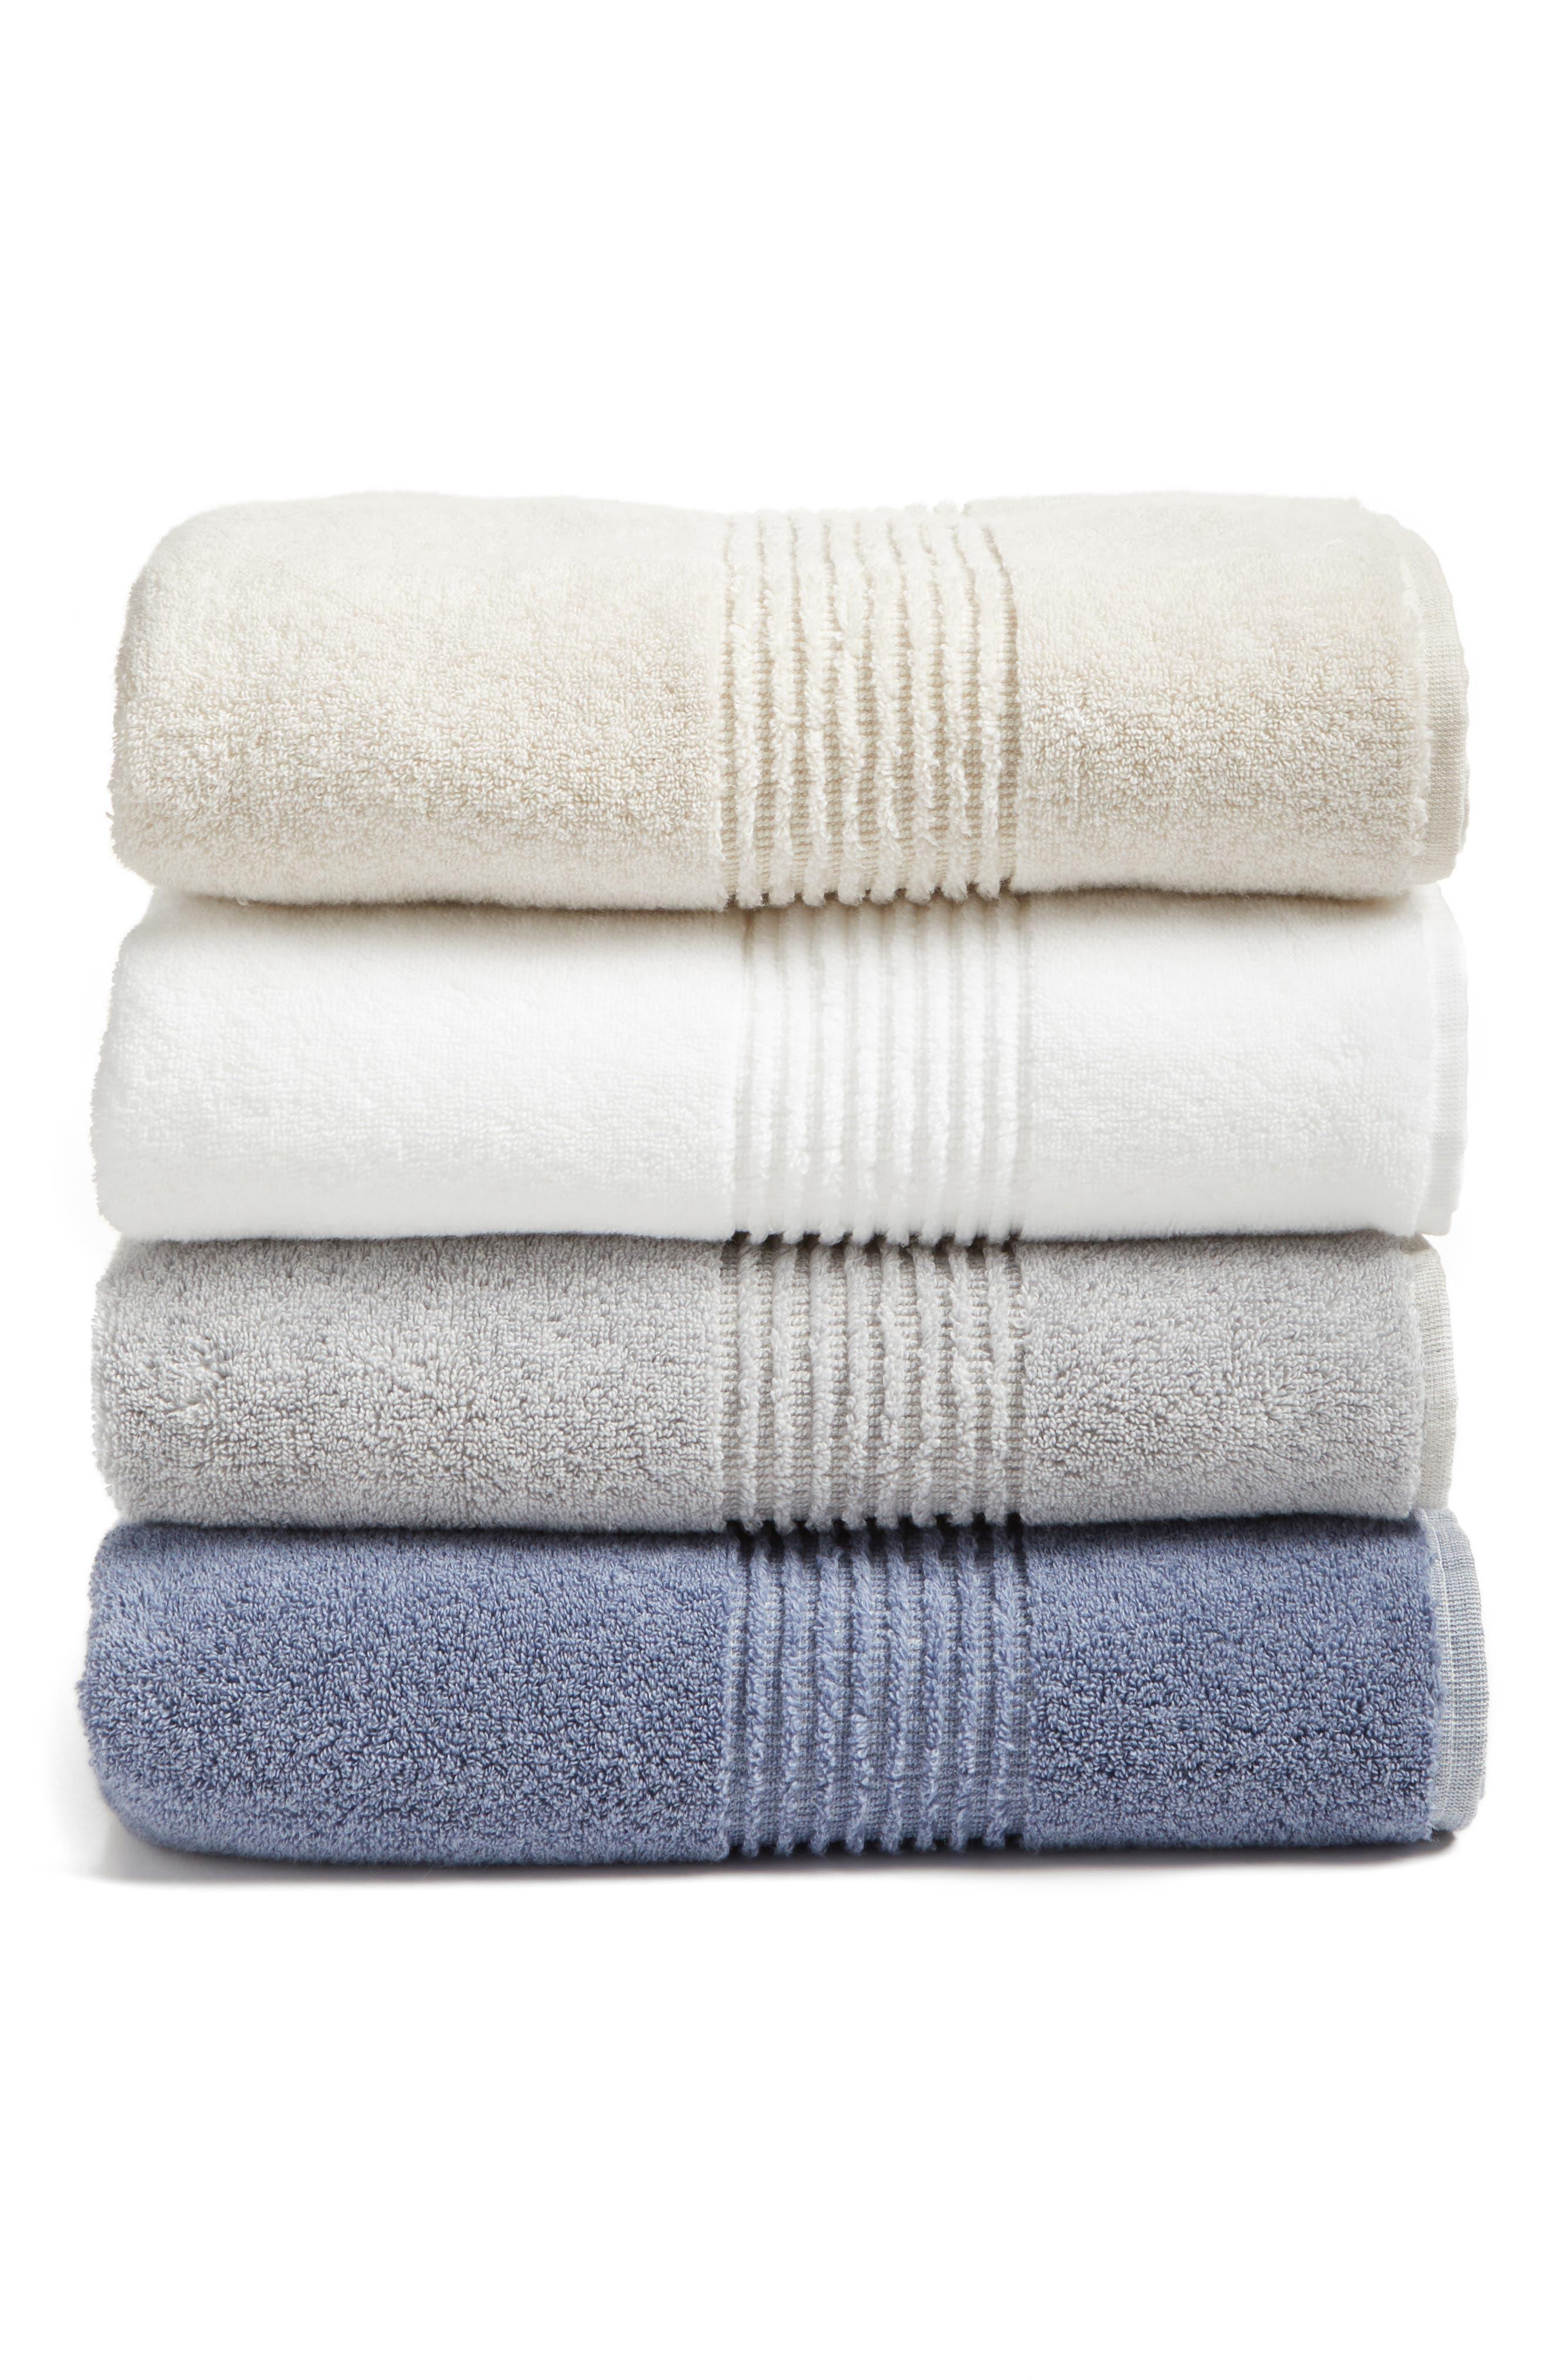 Organic Hydrocotton Heathered Bath Towel,                             Alternate thumbnail 2, color,                             WHITE